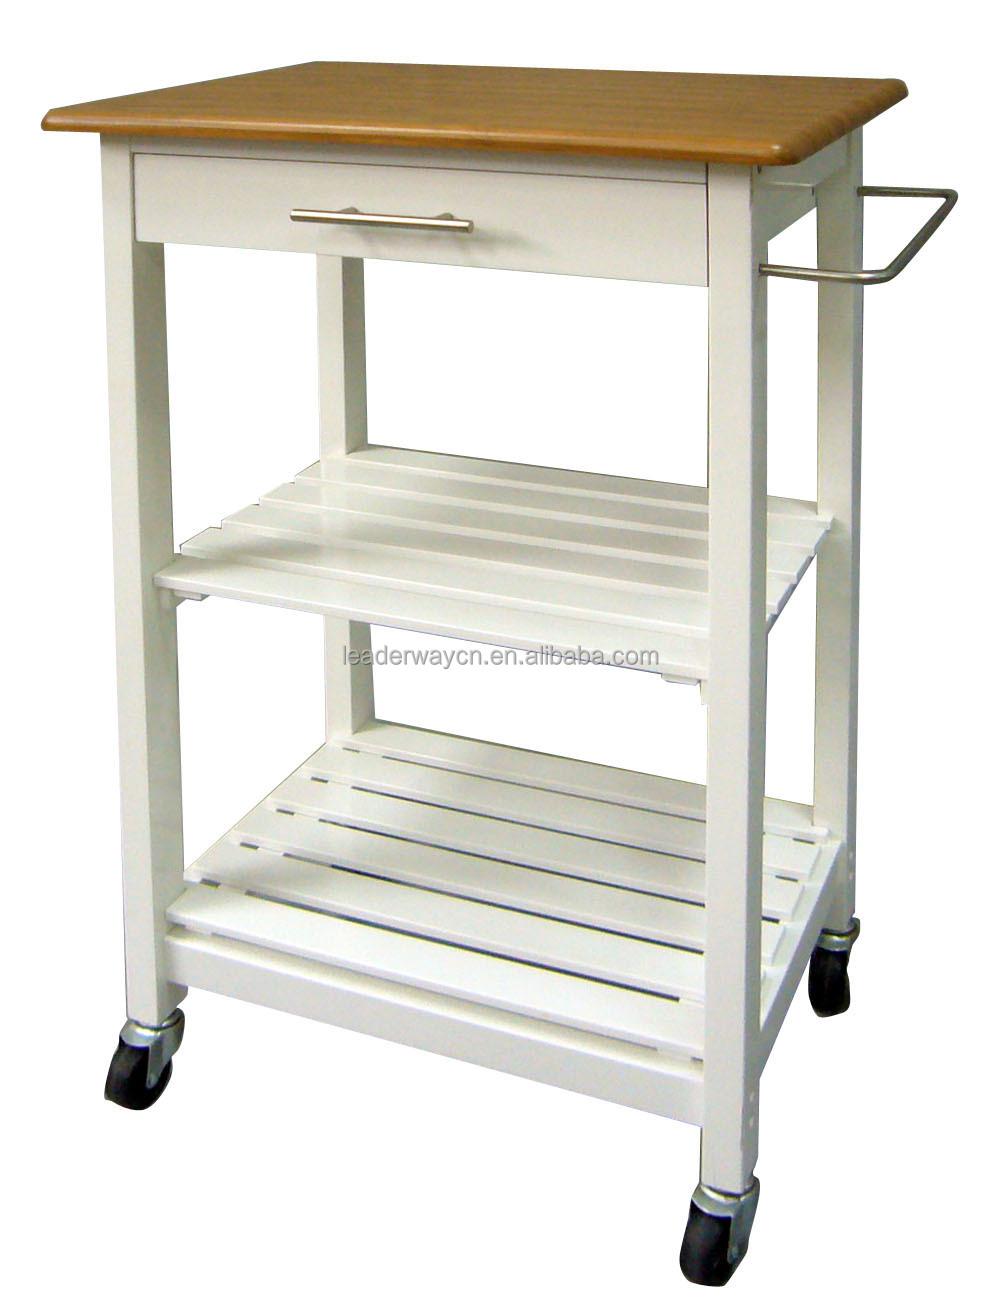 Nieuwe pvc top houten keuken kar/keuken trolley met lade en wiel ...